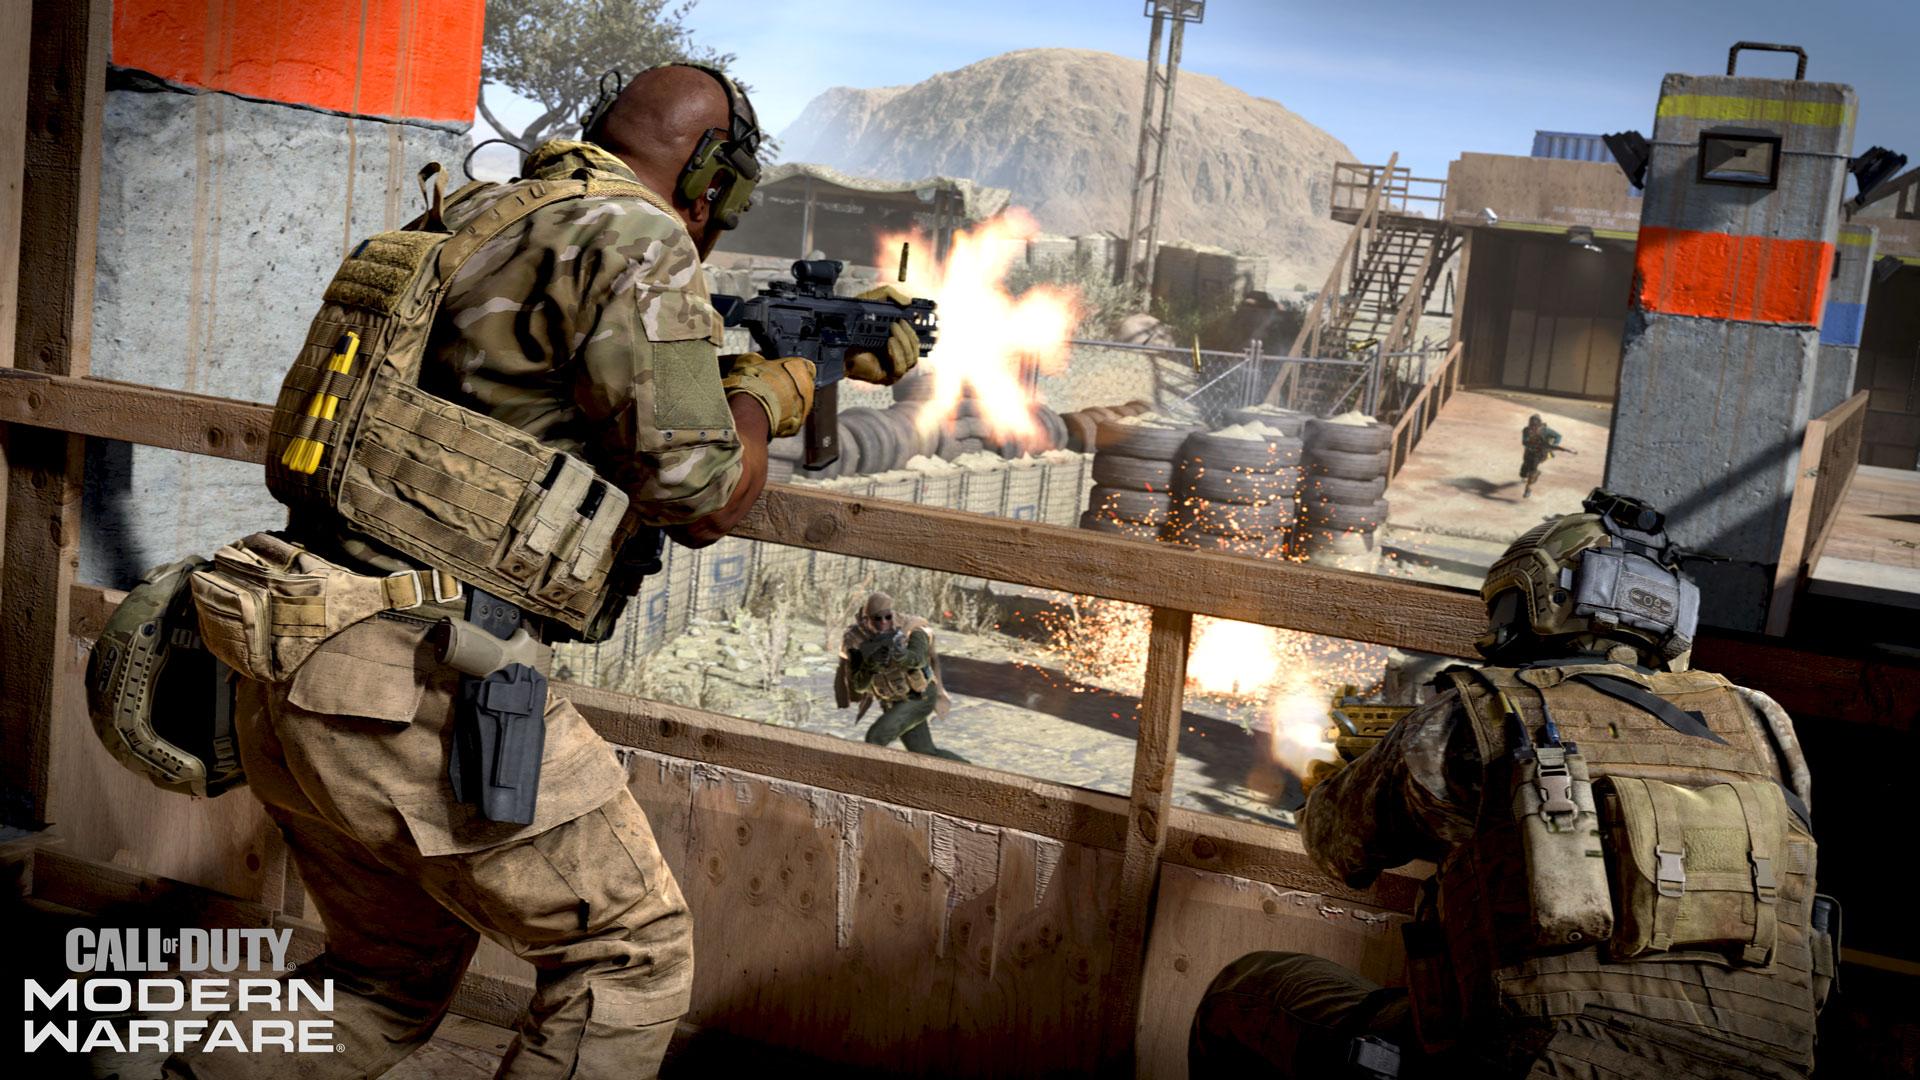 call-of-duty:-modern-warfare-playlist-update-adds-al-raab-airbase-and-drainage-back-in